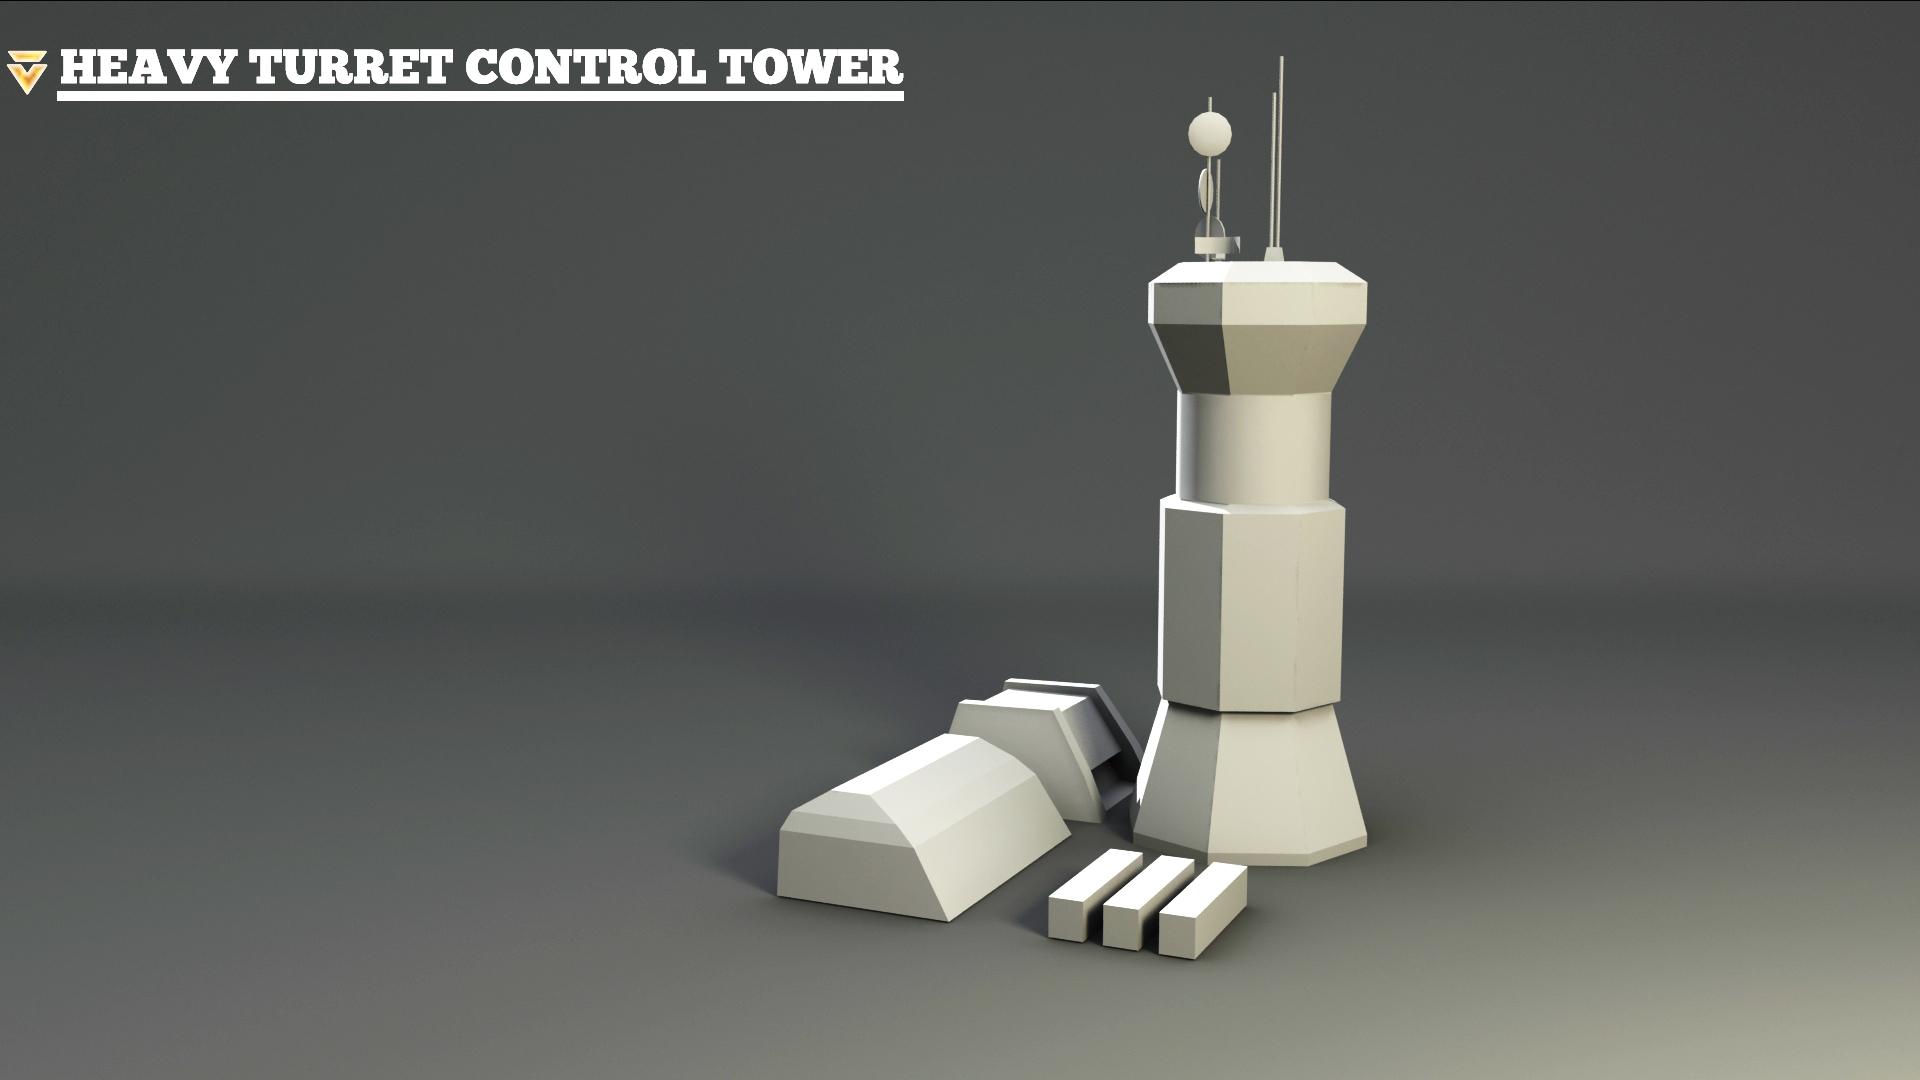 hvyturretcontrol